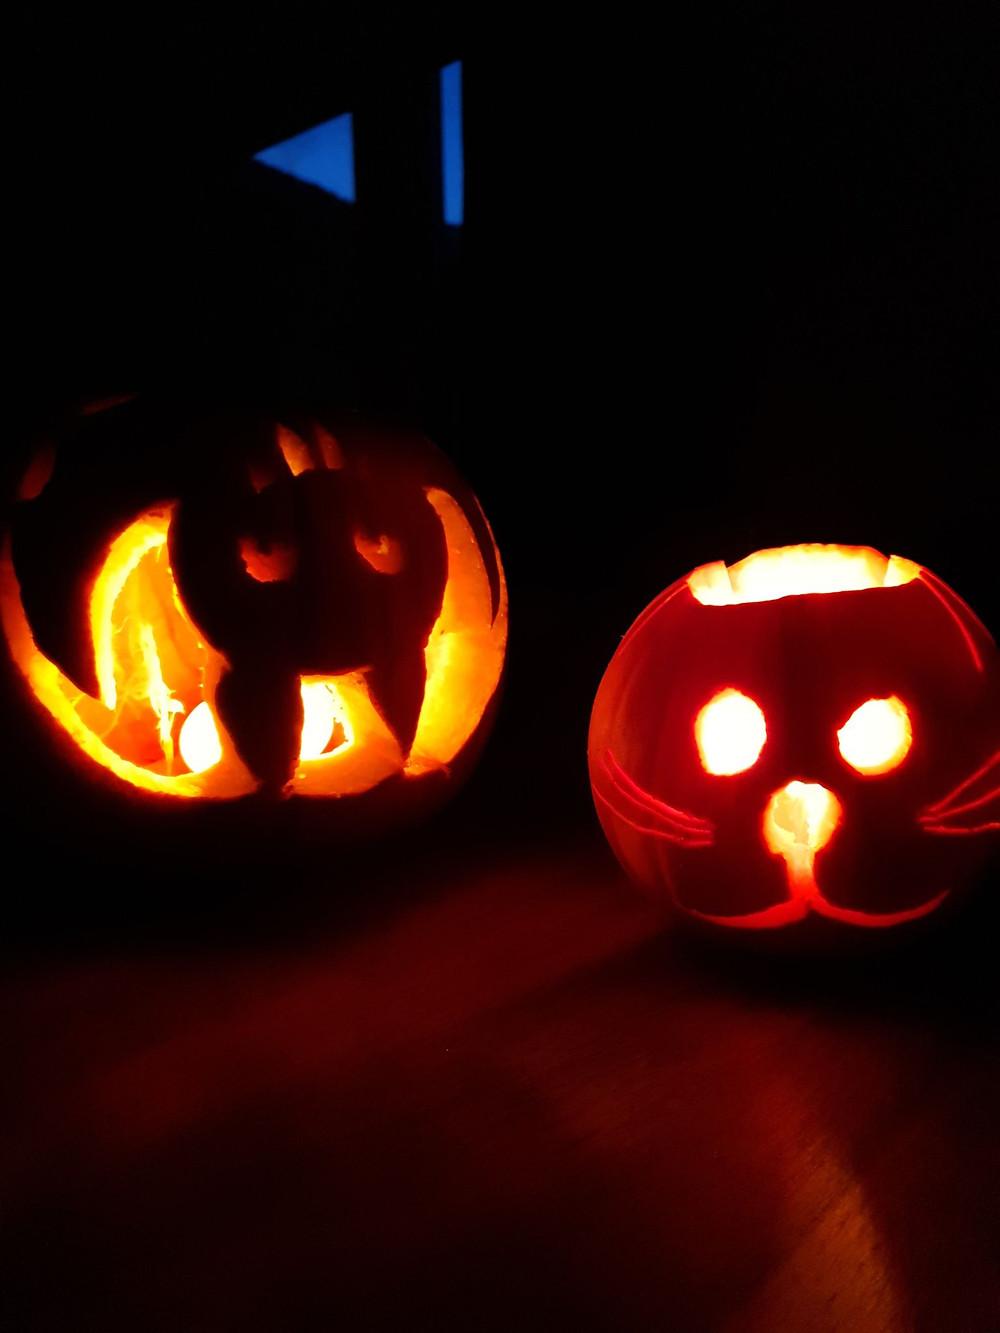 Pumpkin carving bat and cat, Halloween 2020